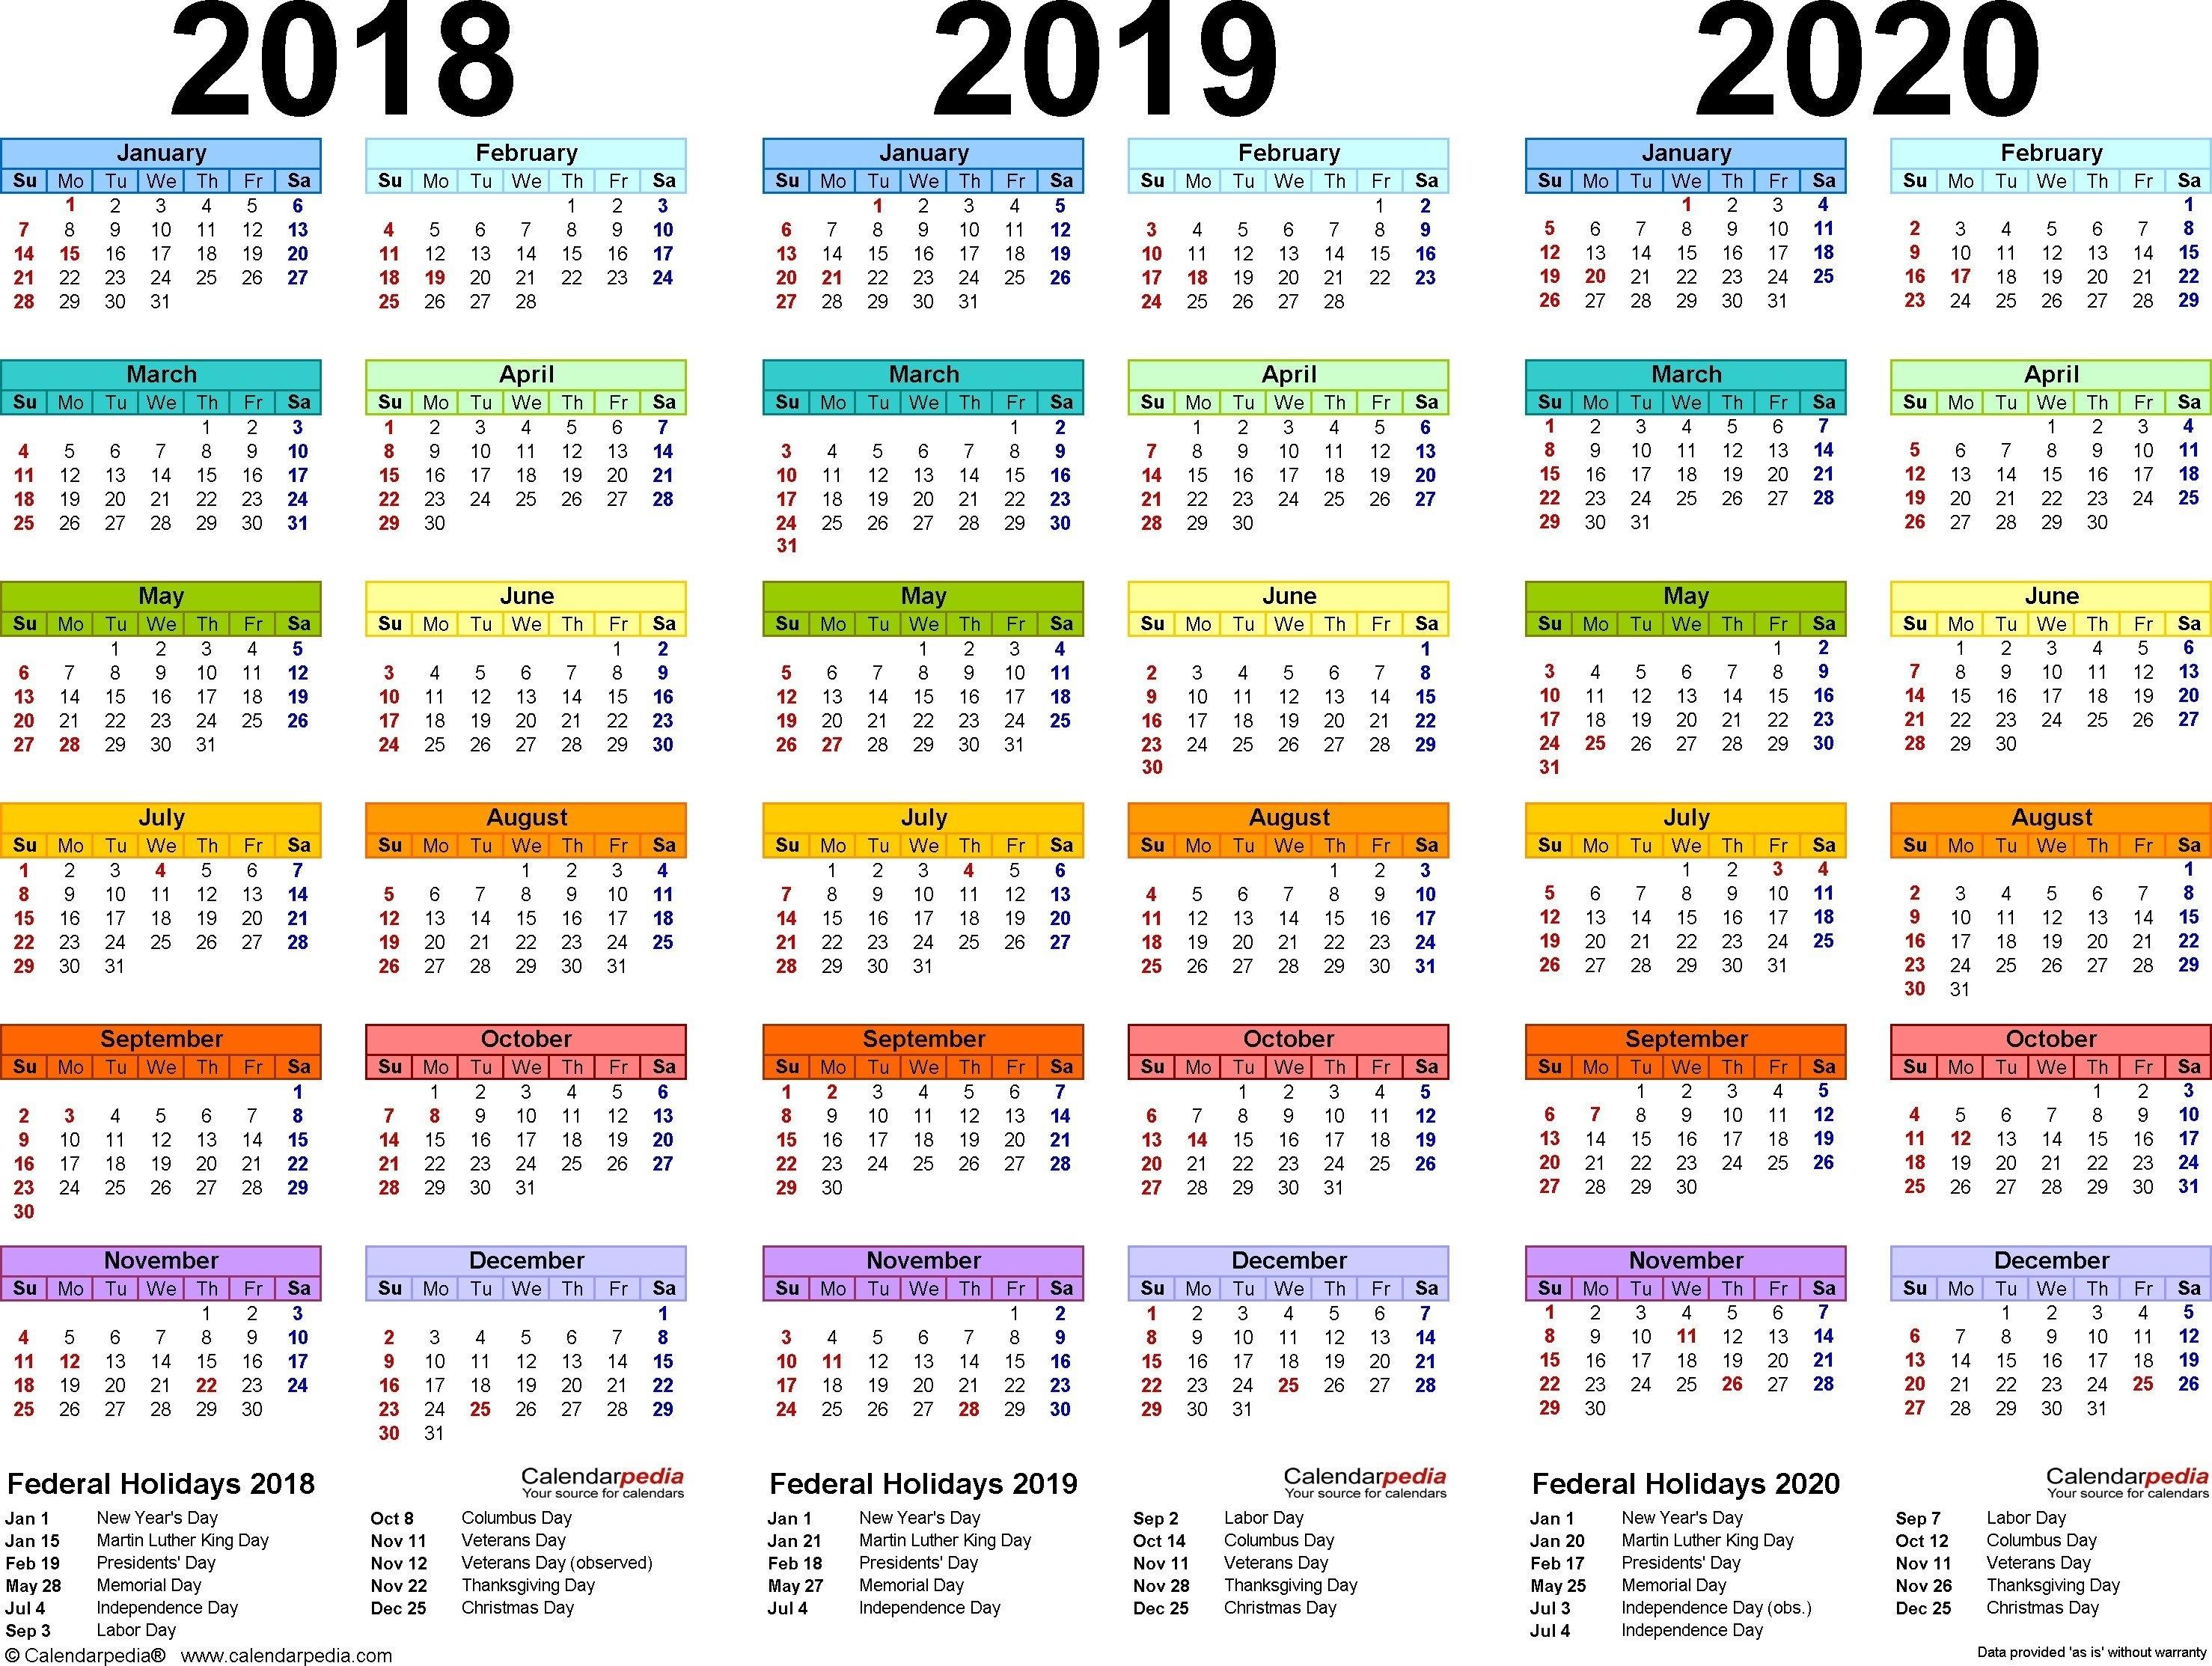 2019 Gsa Pay Calendar Nice 5 Year Calendar Template S Yearly Calendar 2019 Gsa